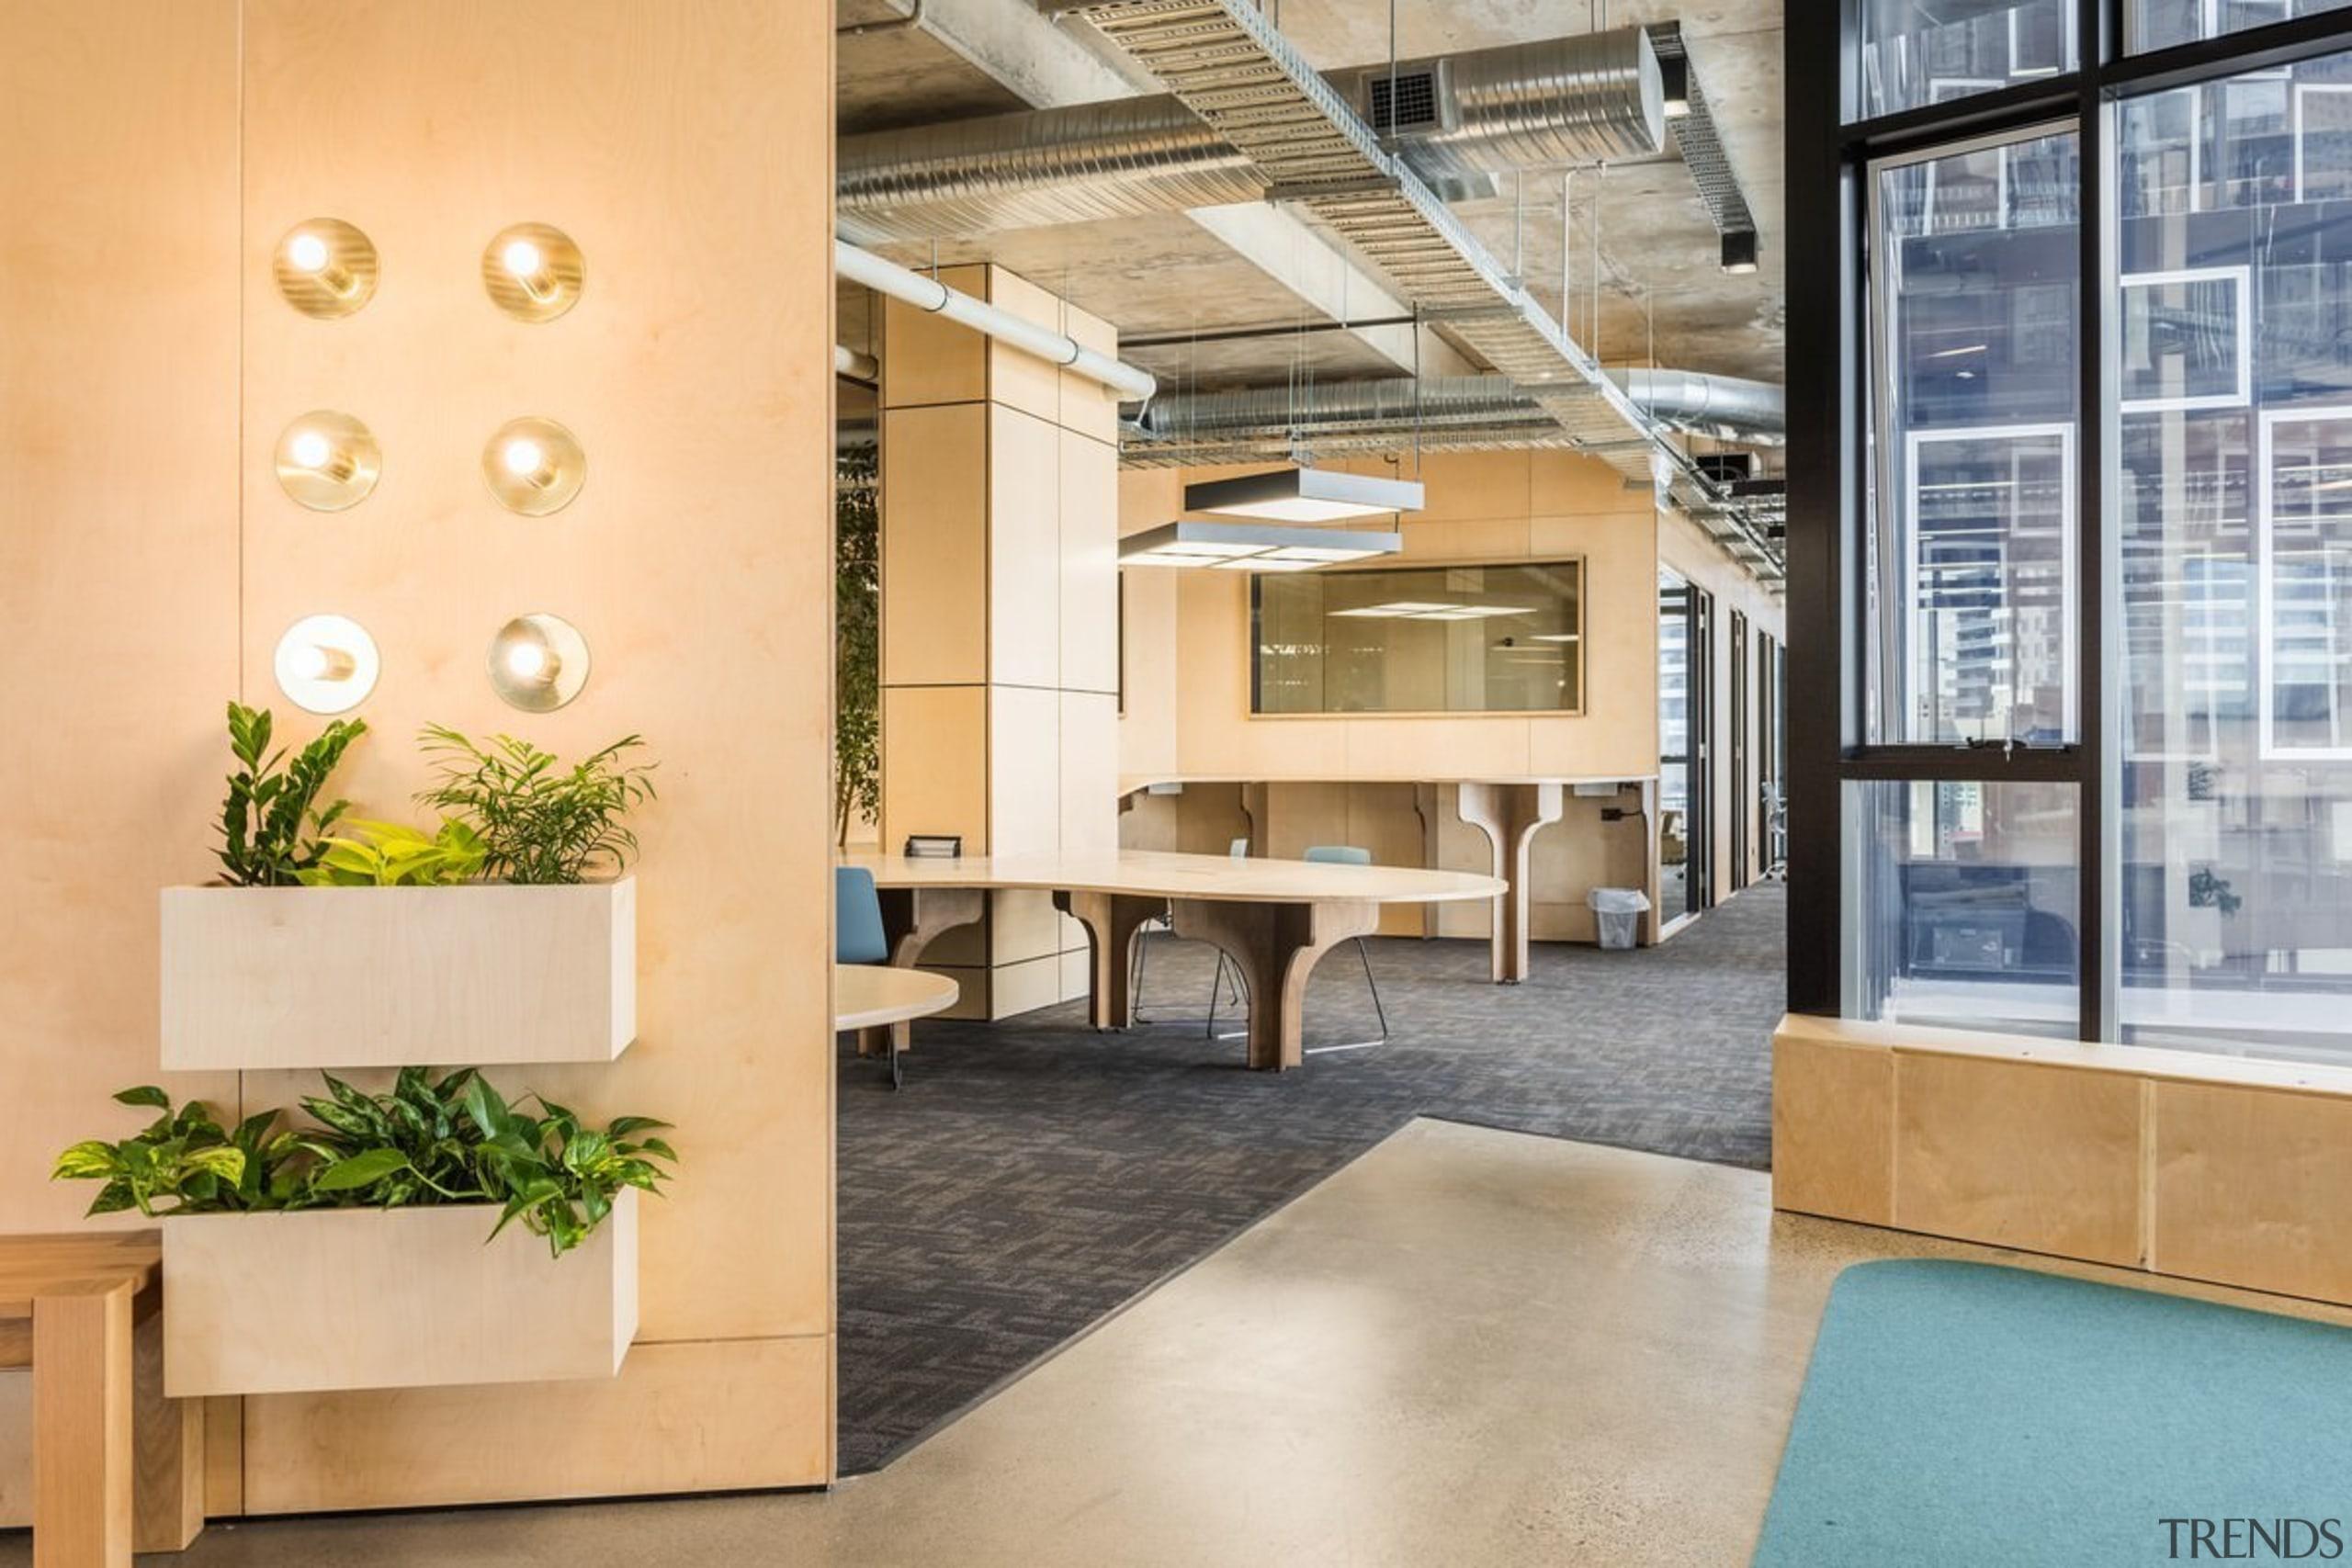 Designed by: Siren Design GroupPhotography by Cheyne floor, flooring, interior design, lobby, loft, orange, gray